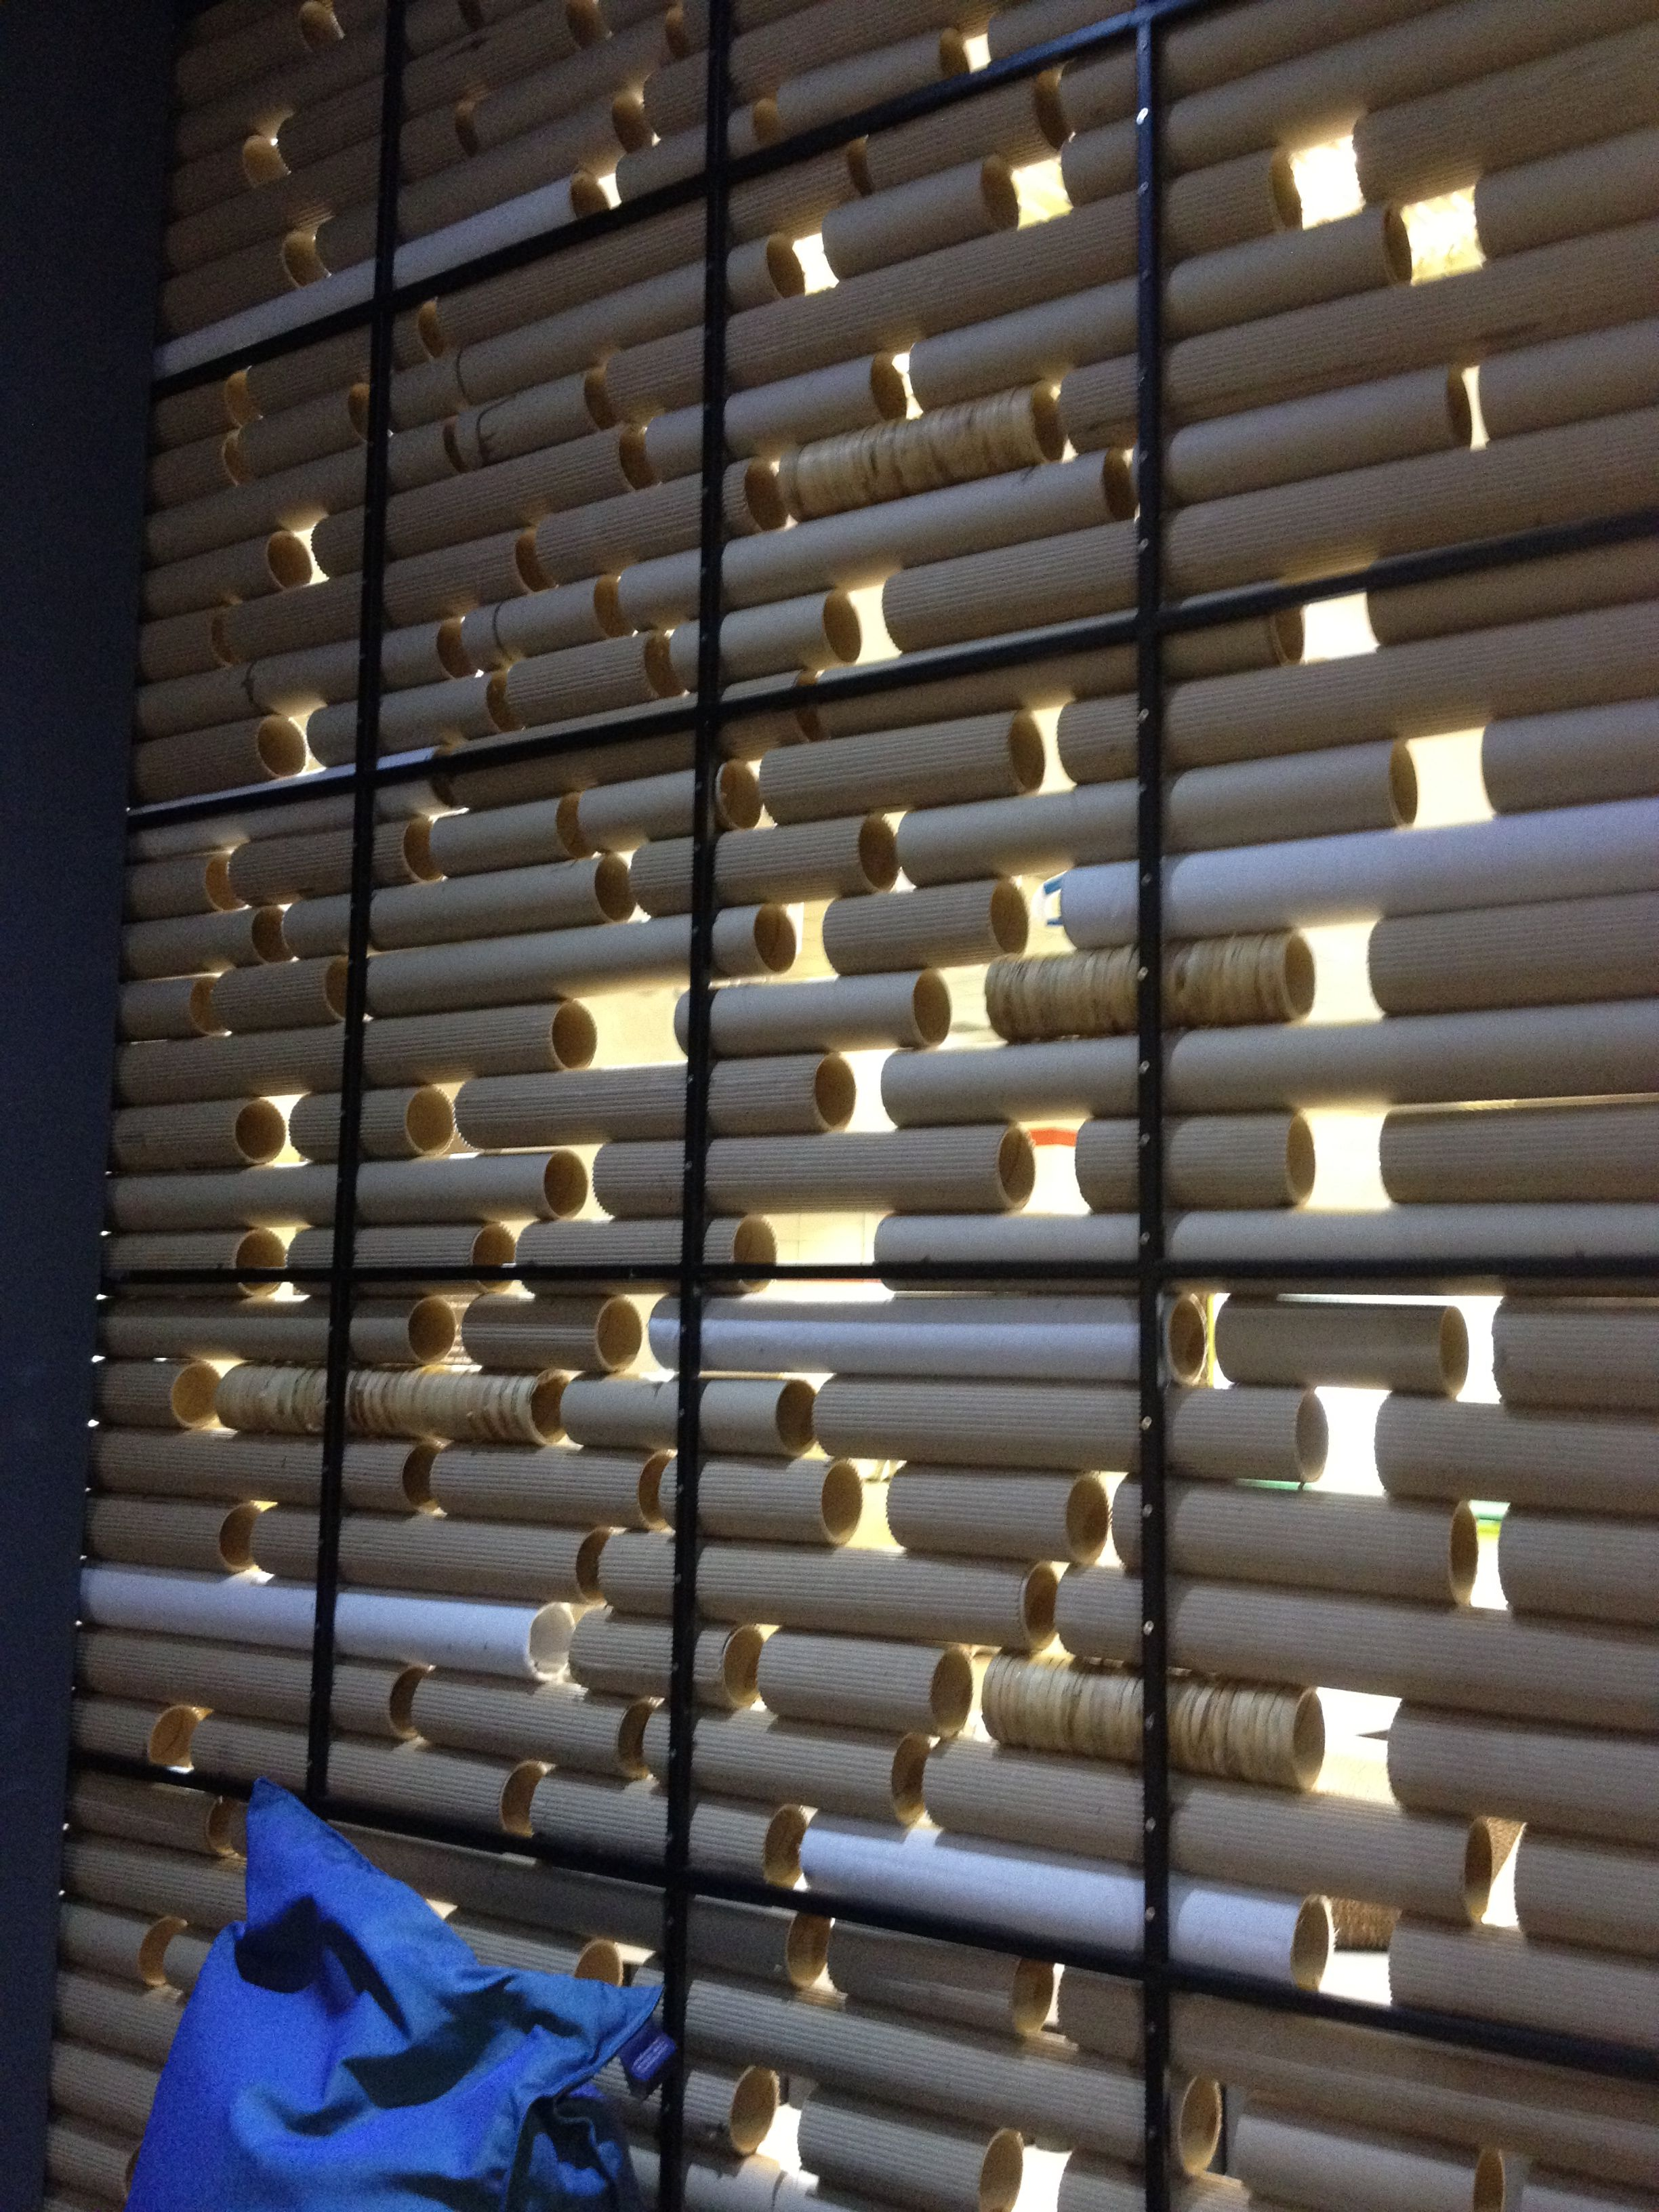 Cardboard tube wall Great idea for a